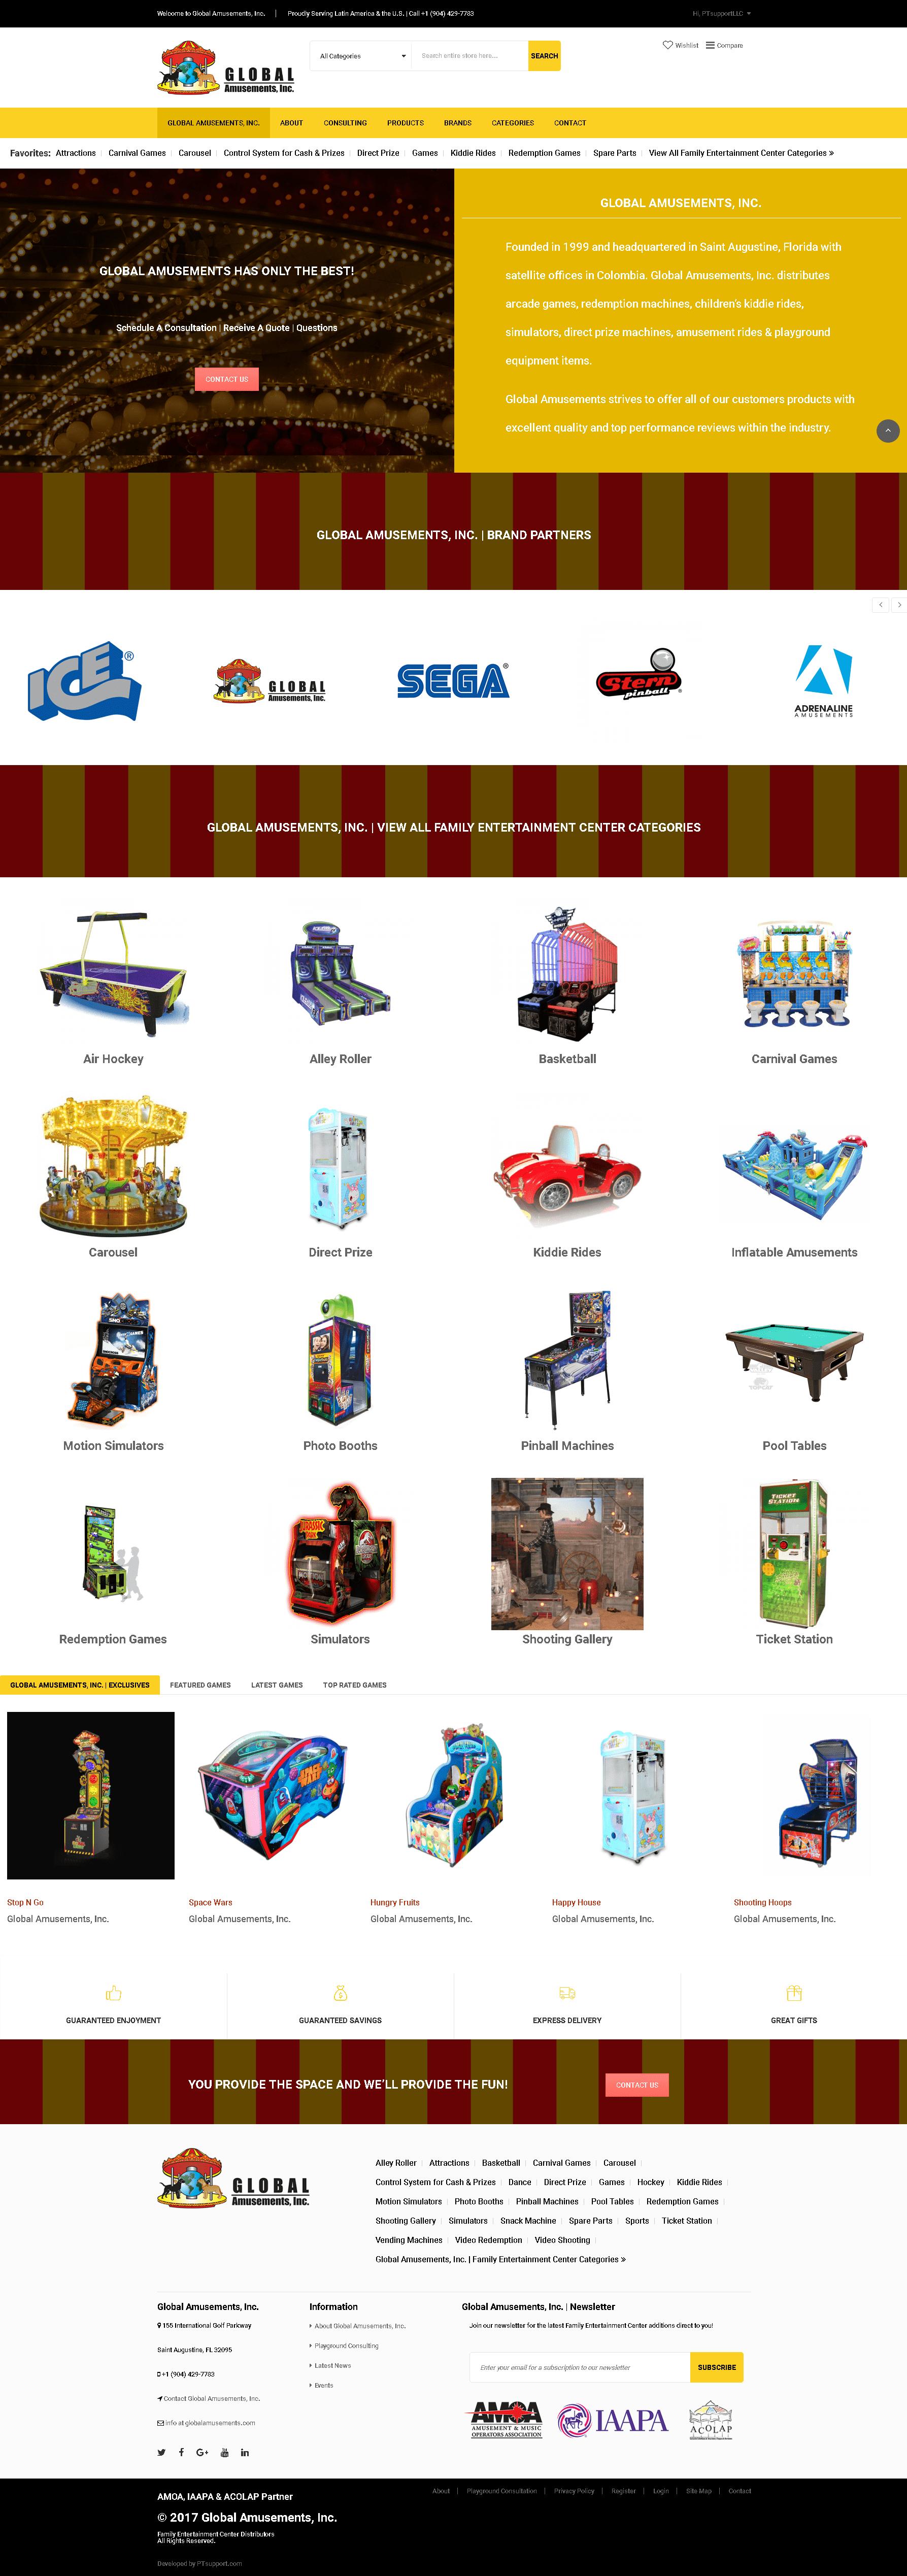 Global Amusements, Inc. | PTsupport.com Web Development, Design, SEO, Branding